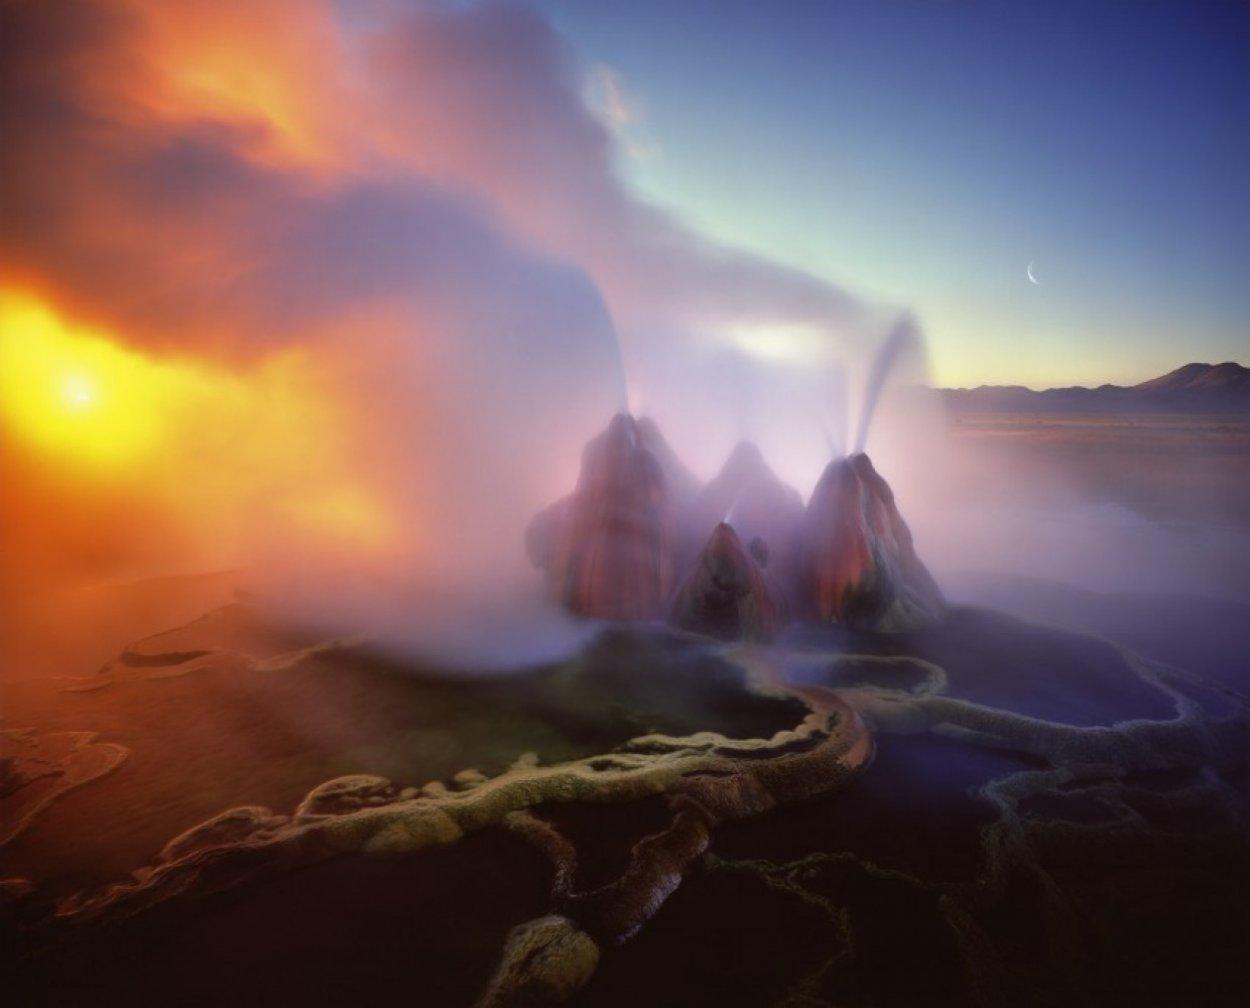 Earth Spirit Rising 2002 Panorama by Michael Fatali